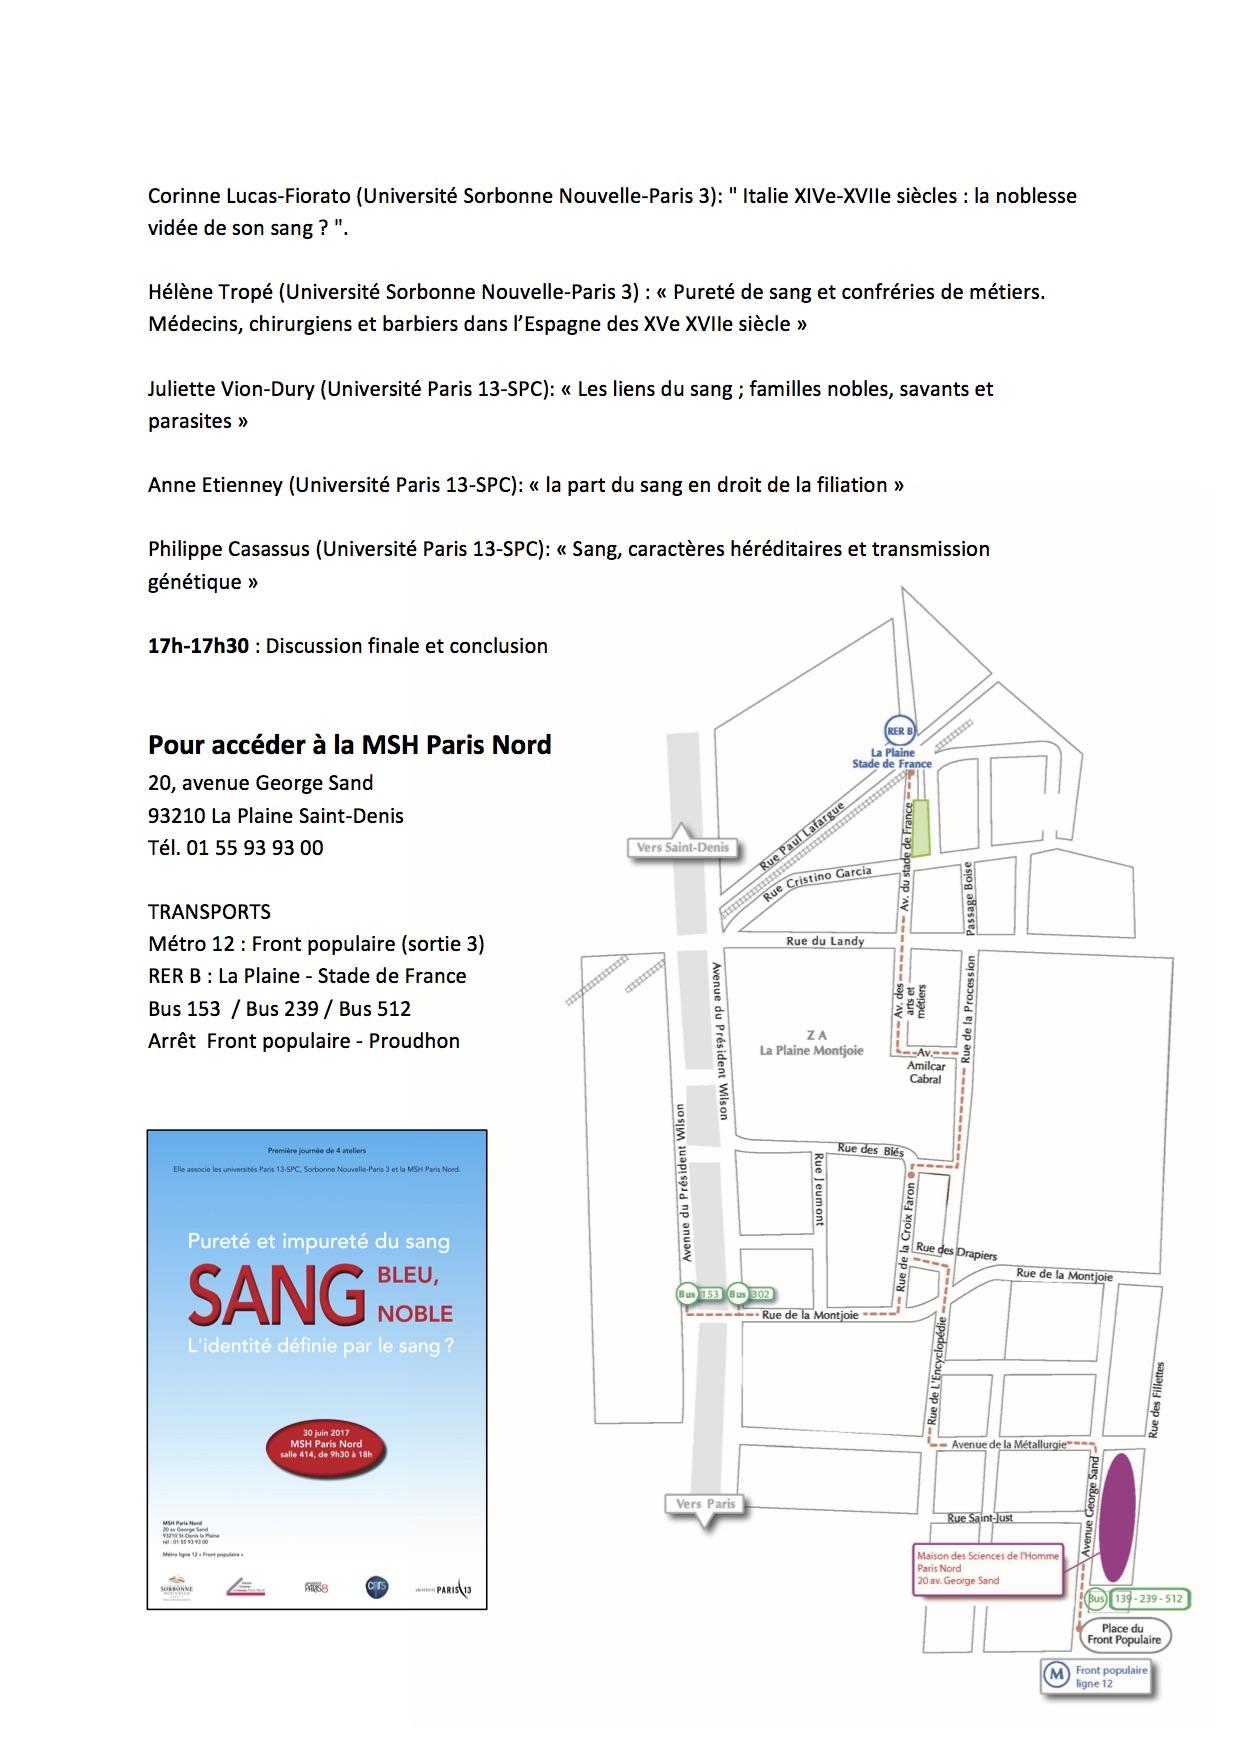 prog-sang-30juin2017